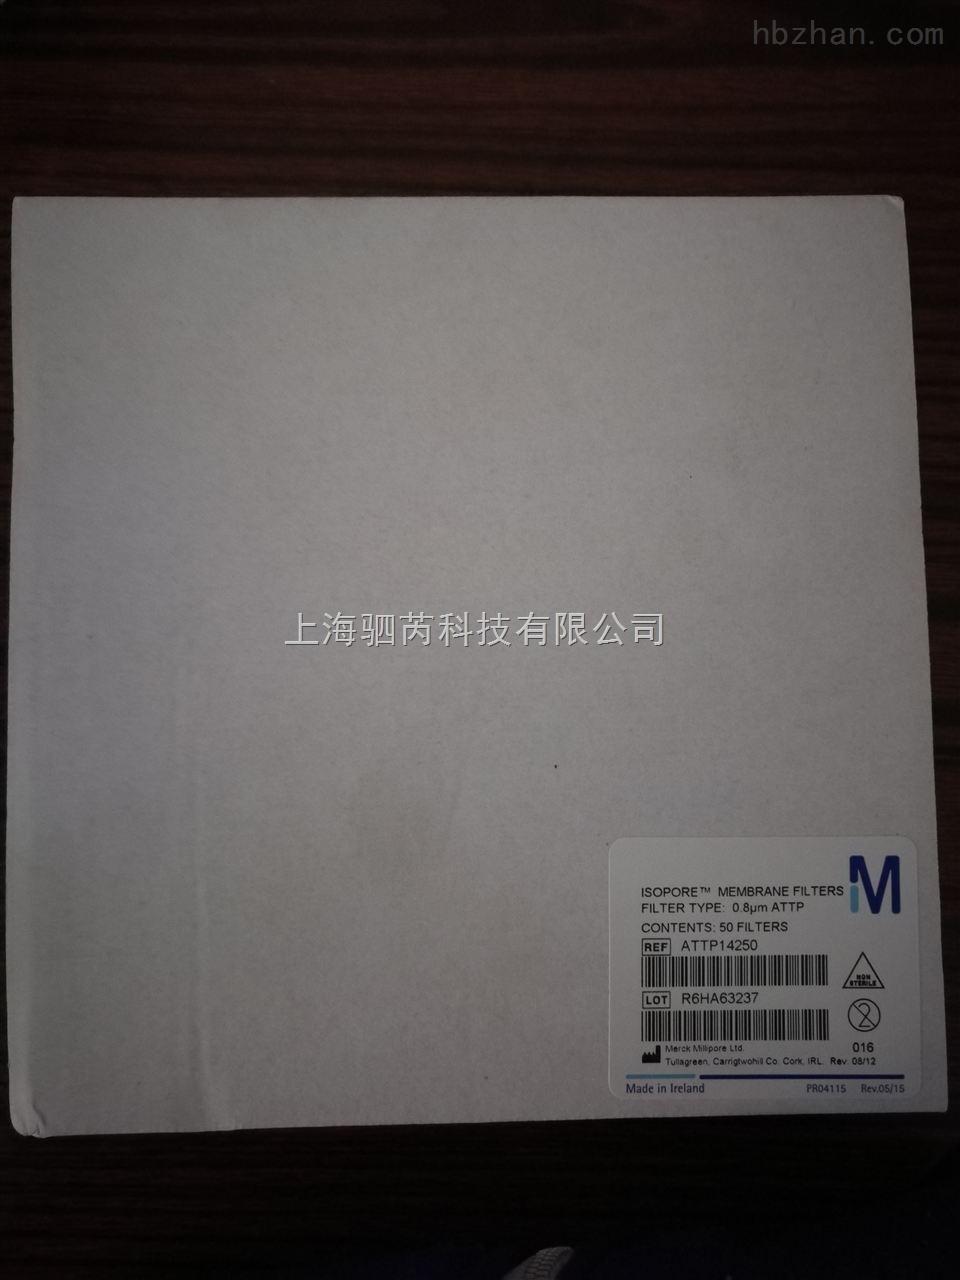 默克密理博Millipore142mm聚碳酸酯膜0.8um孔径Isopore表面滤膜